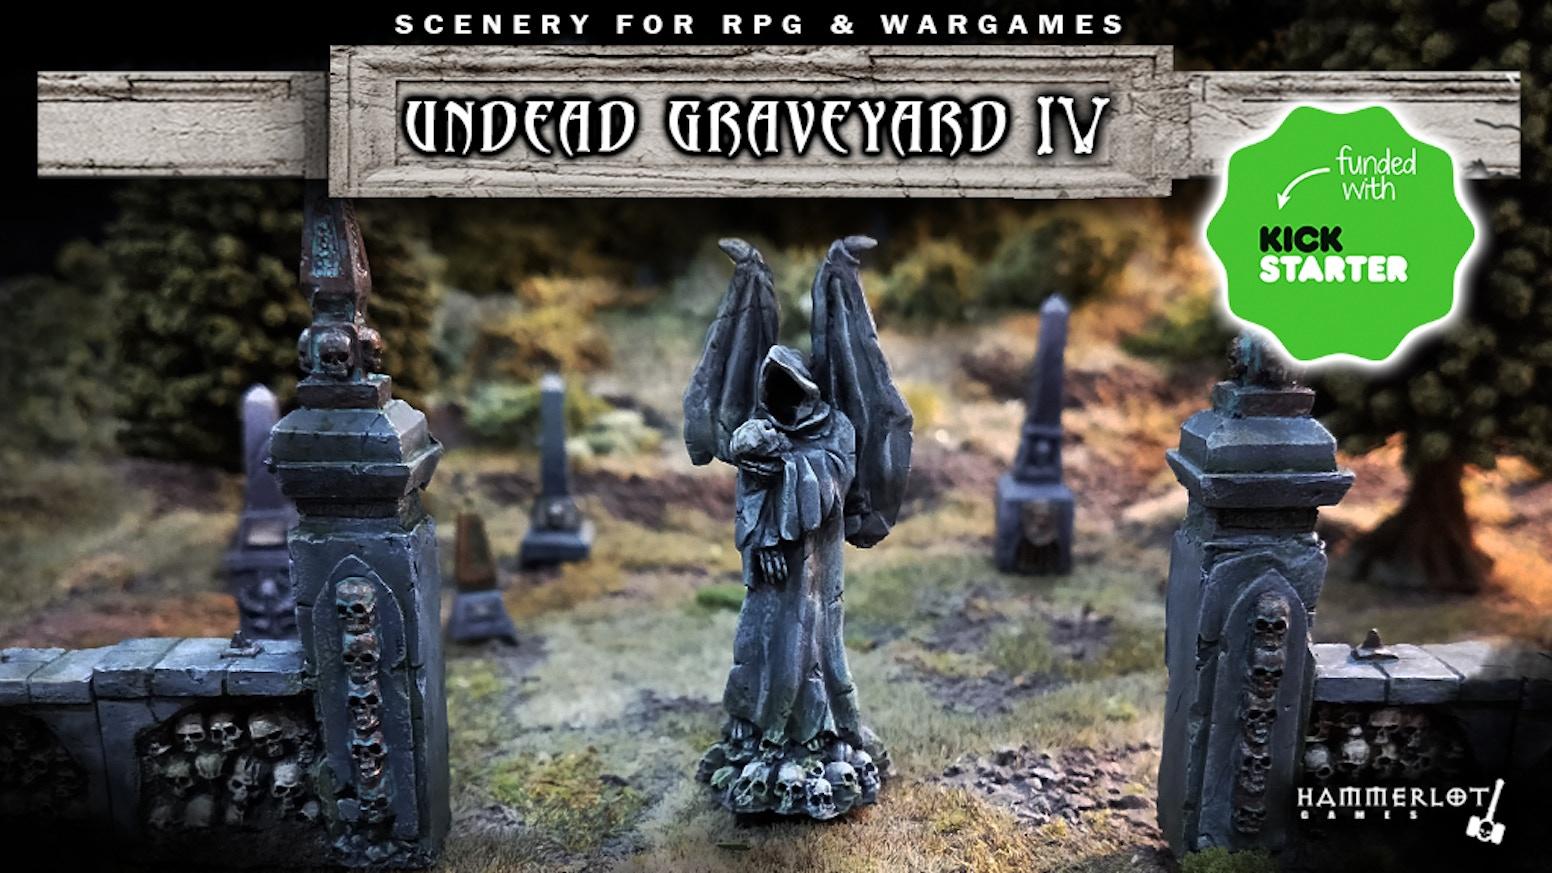 Undead scenery, Graveyard Statues, dead and skulls. Miniatures 28/30mm. Board games, tabletop, RPG, fantasy, wargames